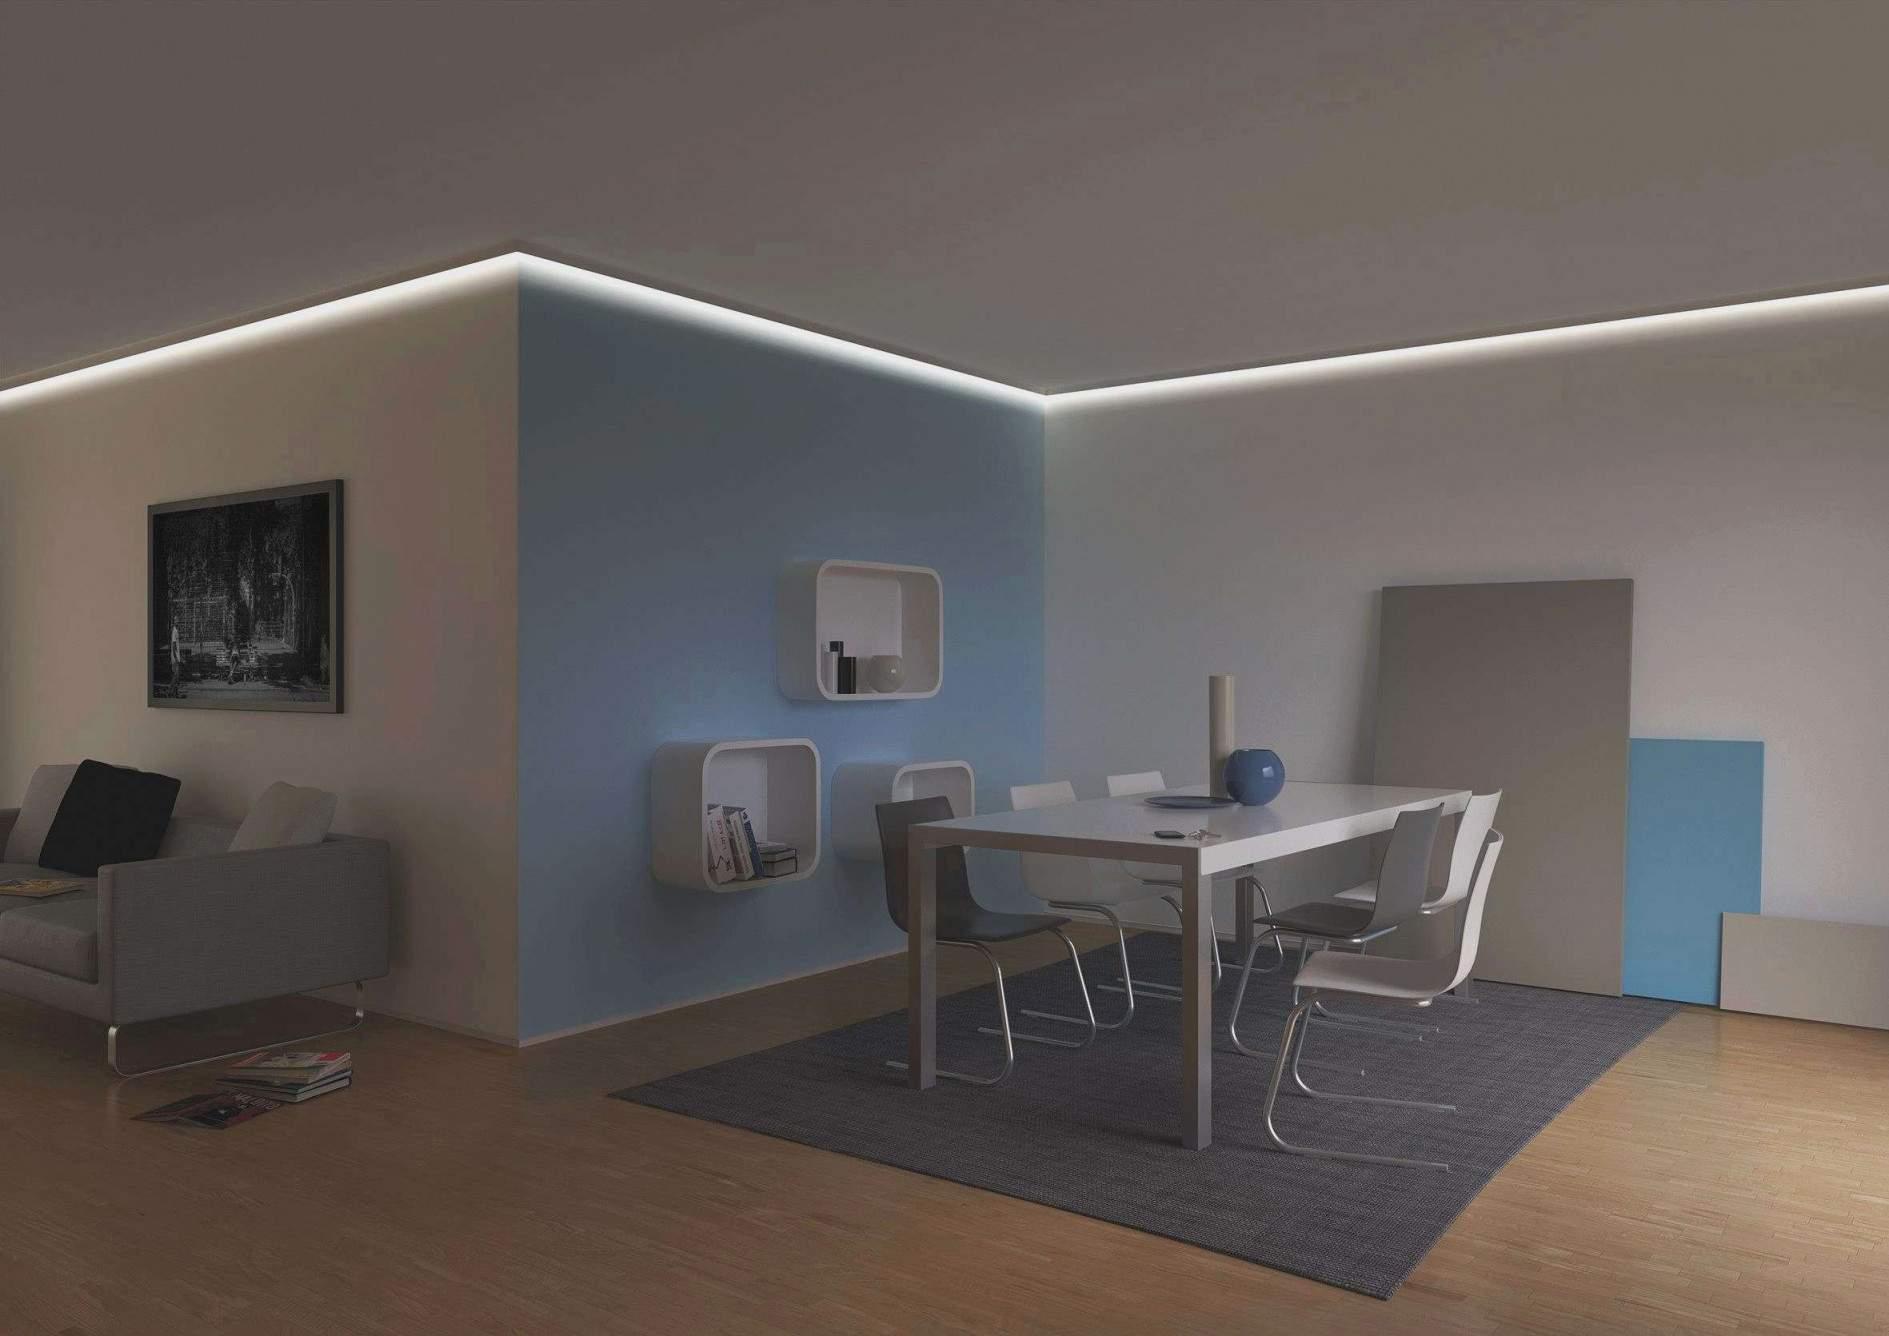 Full Size of Wohnzimmer Indirekte Beleuchtung Selber Bauen Anleitung Decke Modern Ideen Boden Led Machen Wand Deckenbeleuchtung Das Beste Von Deckenlampen Stehlampe Wohnzimmer Wohnzimmer Indirekte Beleuchtung